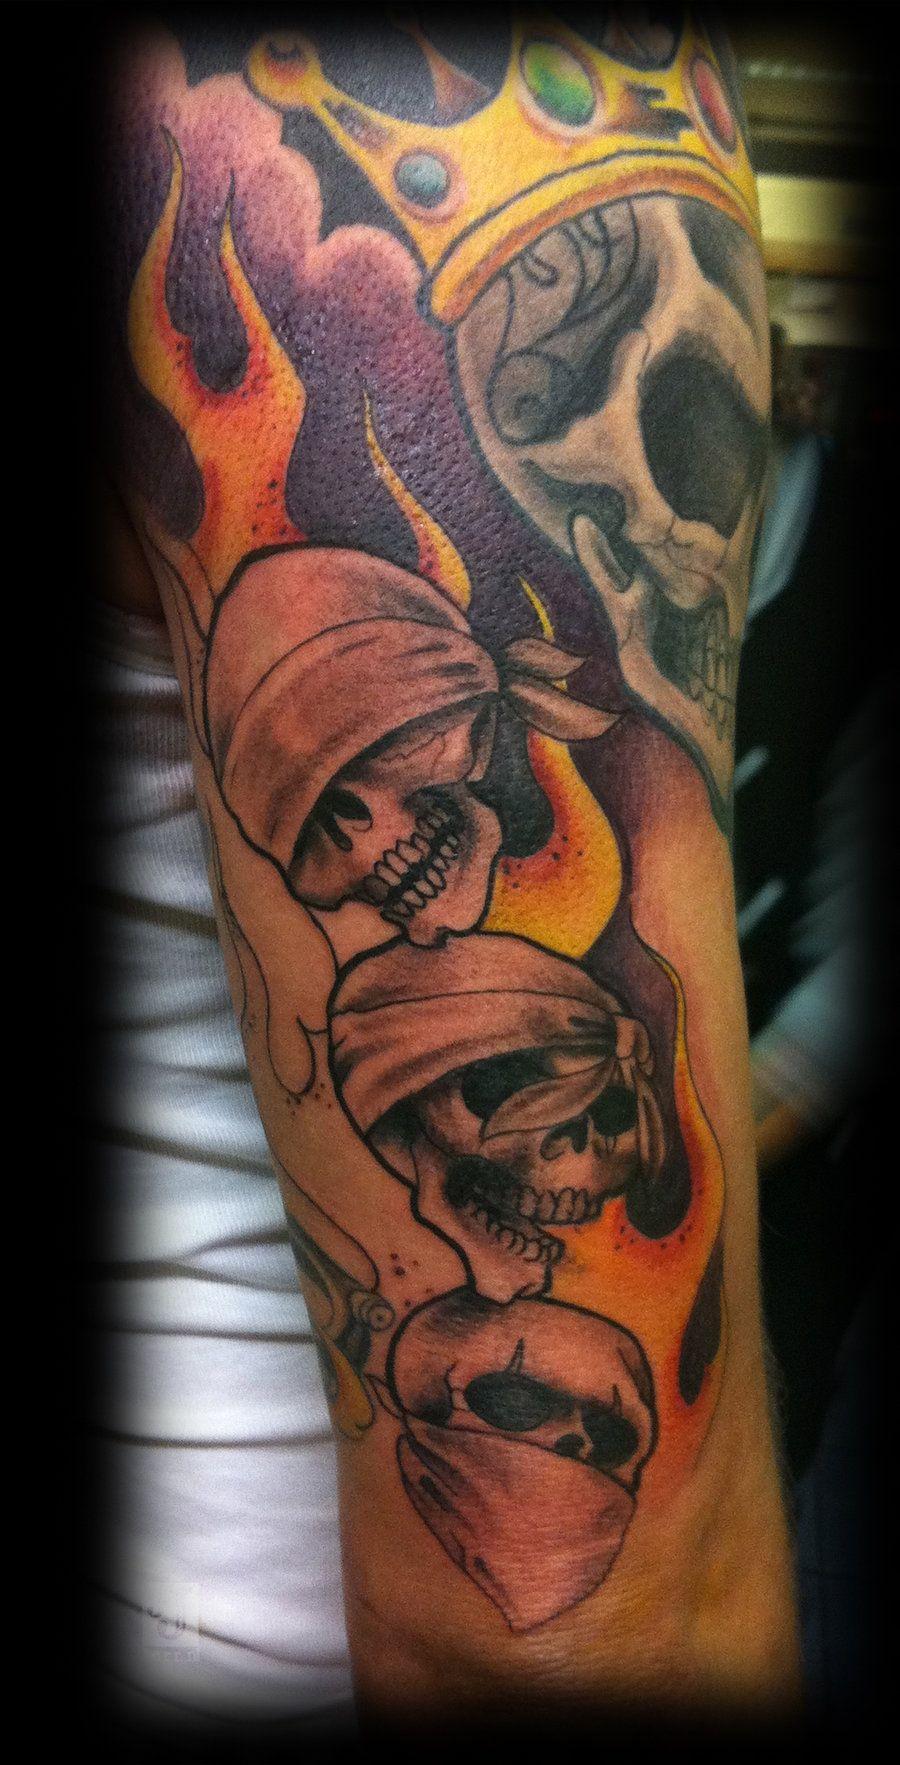 See no Evil, Hear no Evil, Speak no Evil - Tattoo Ideas